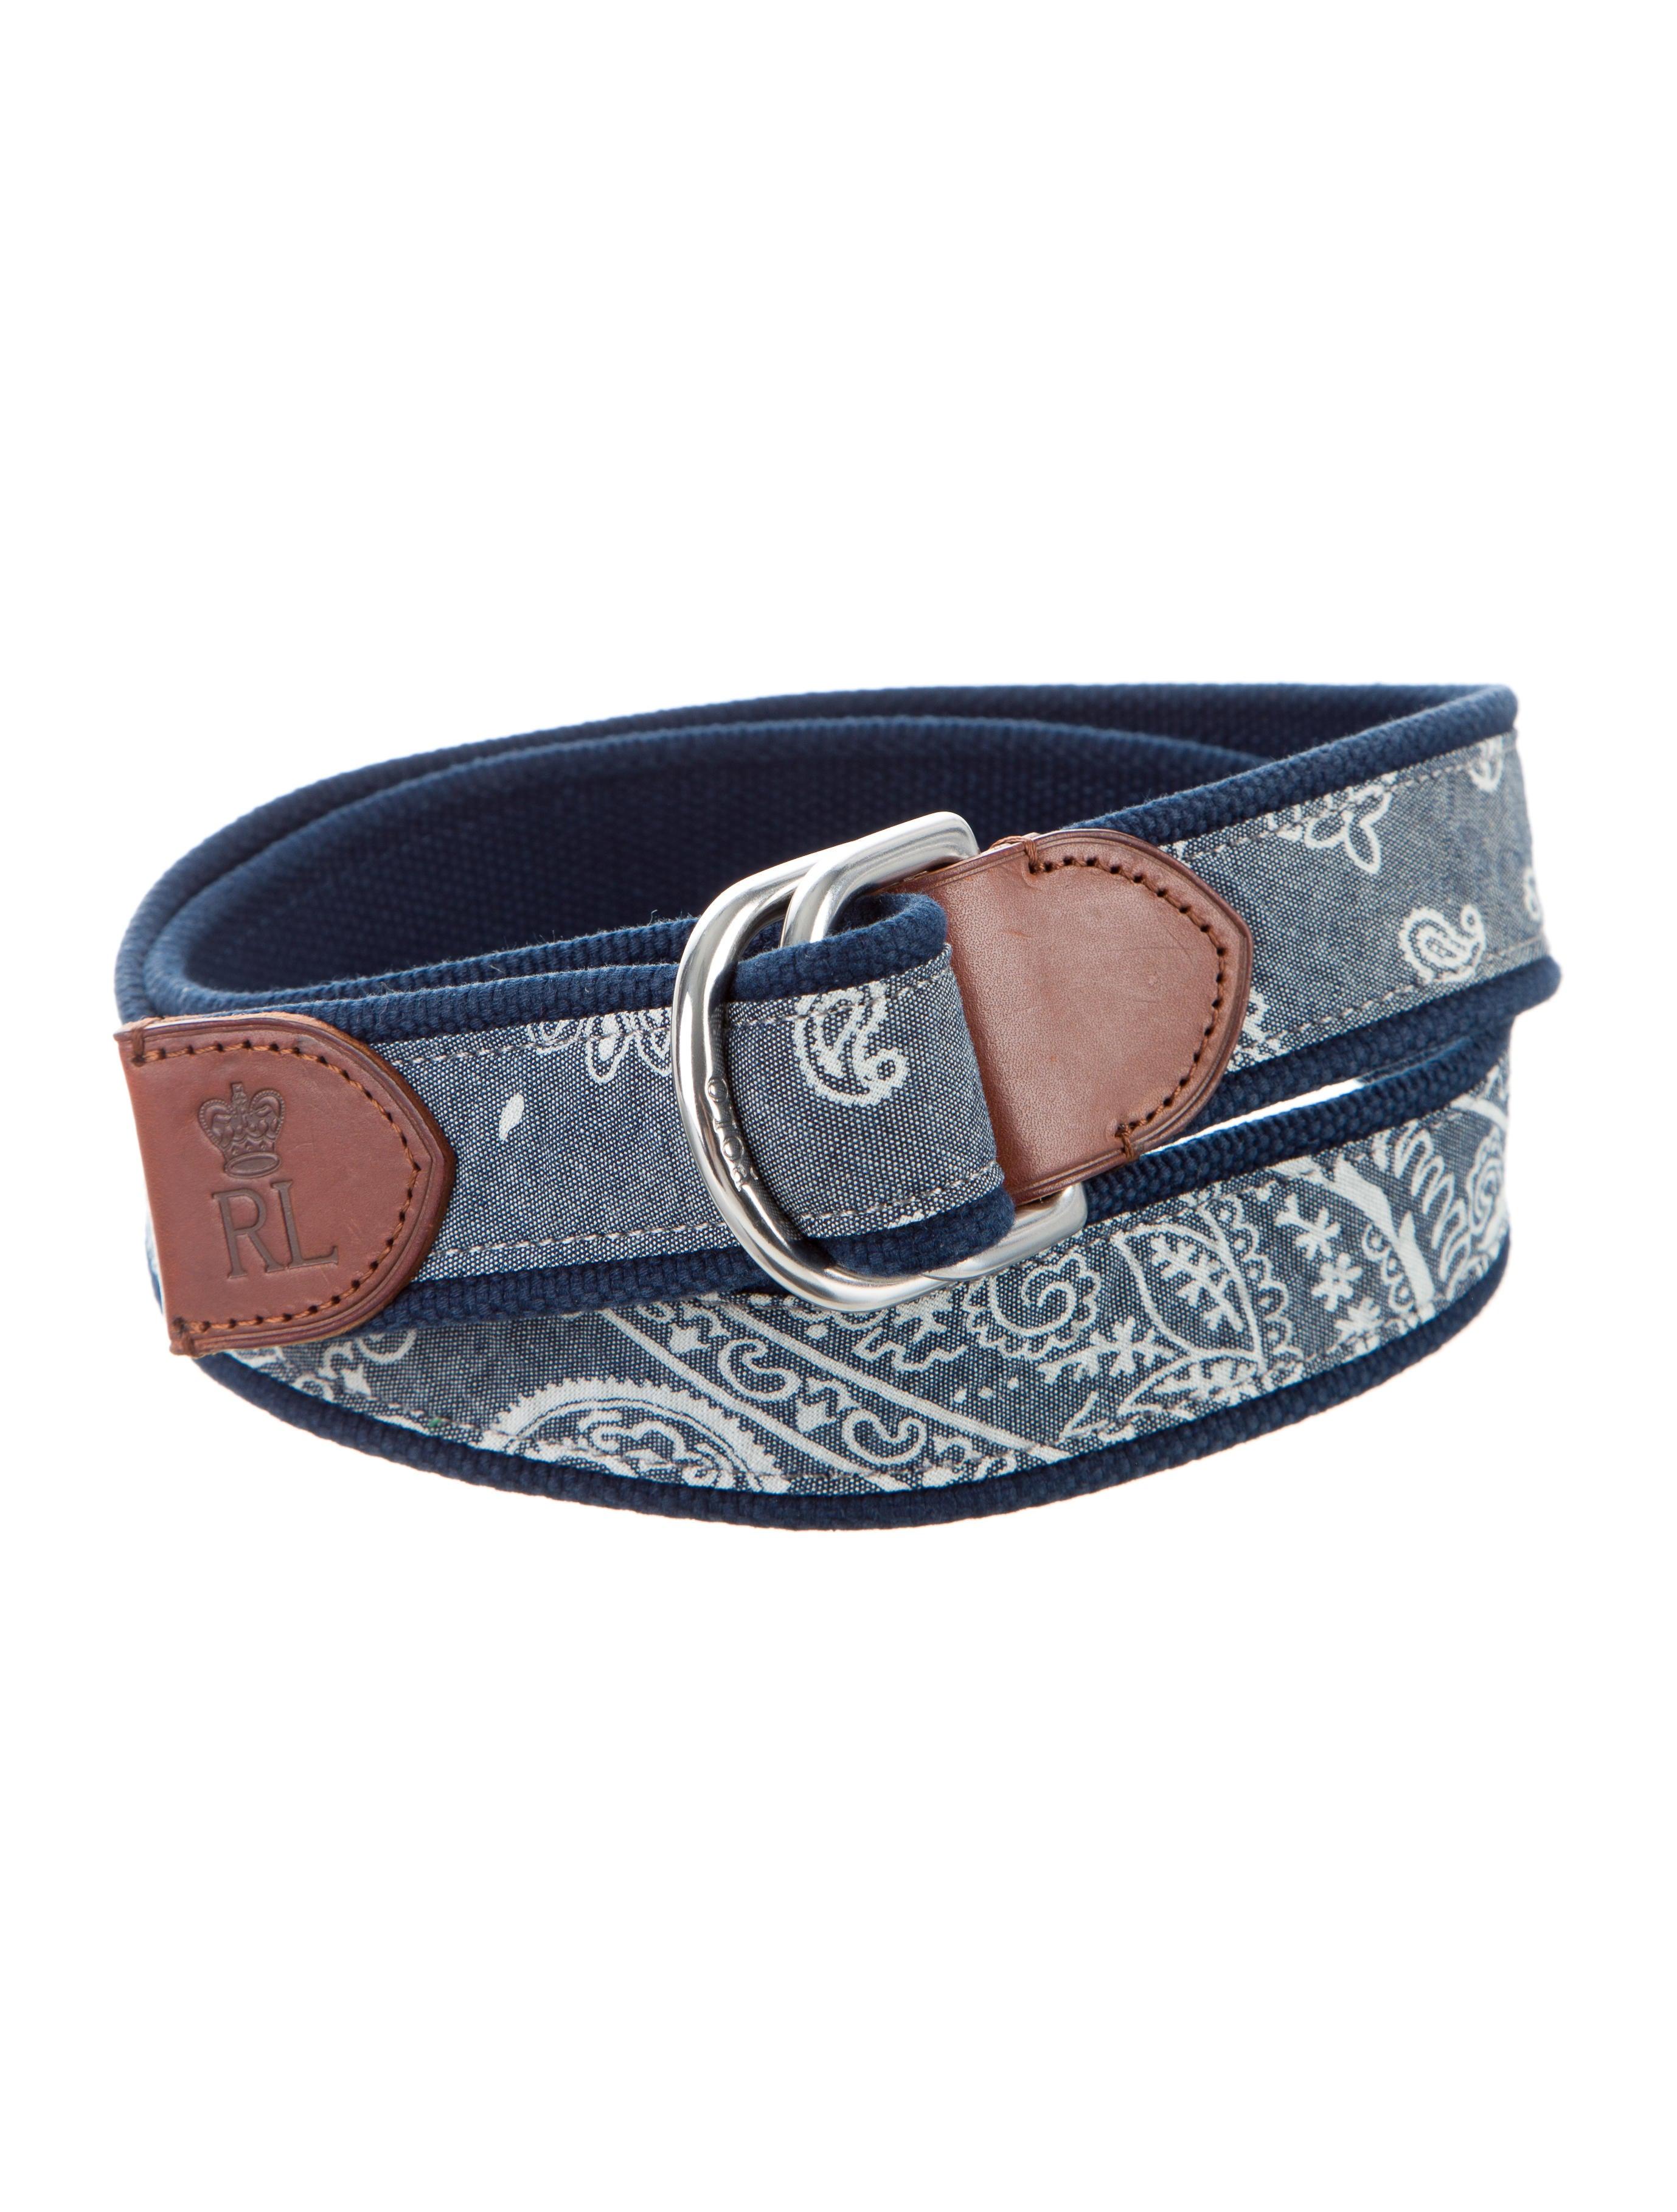 polo ralph lauren bandana print leather trimmed belt. Black Bedroom Furniture Sets. Home Design Ideas